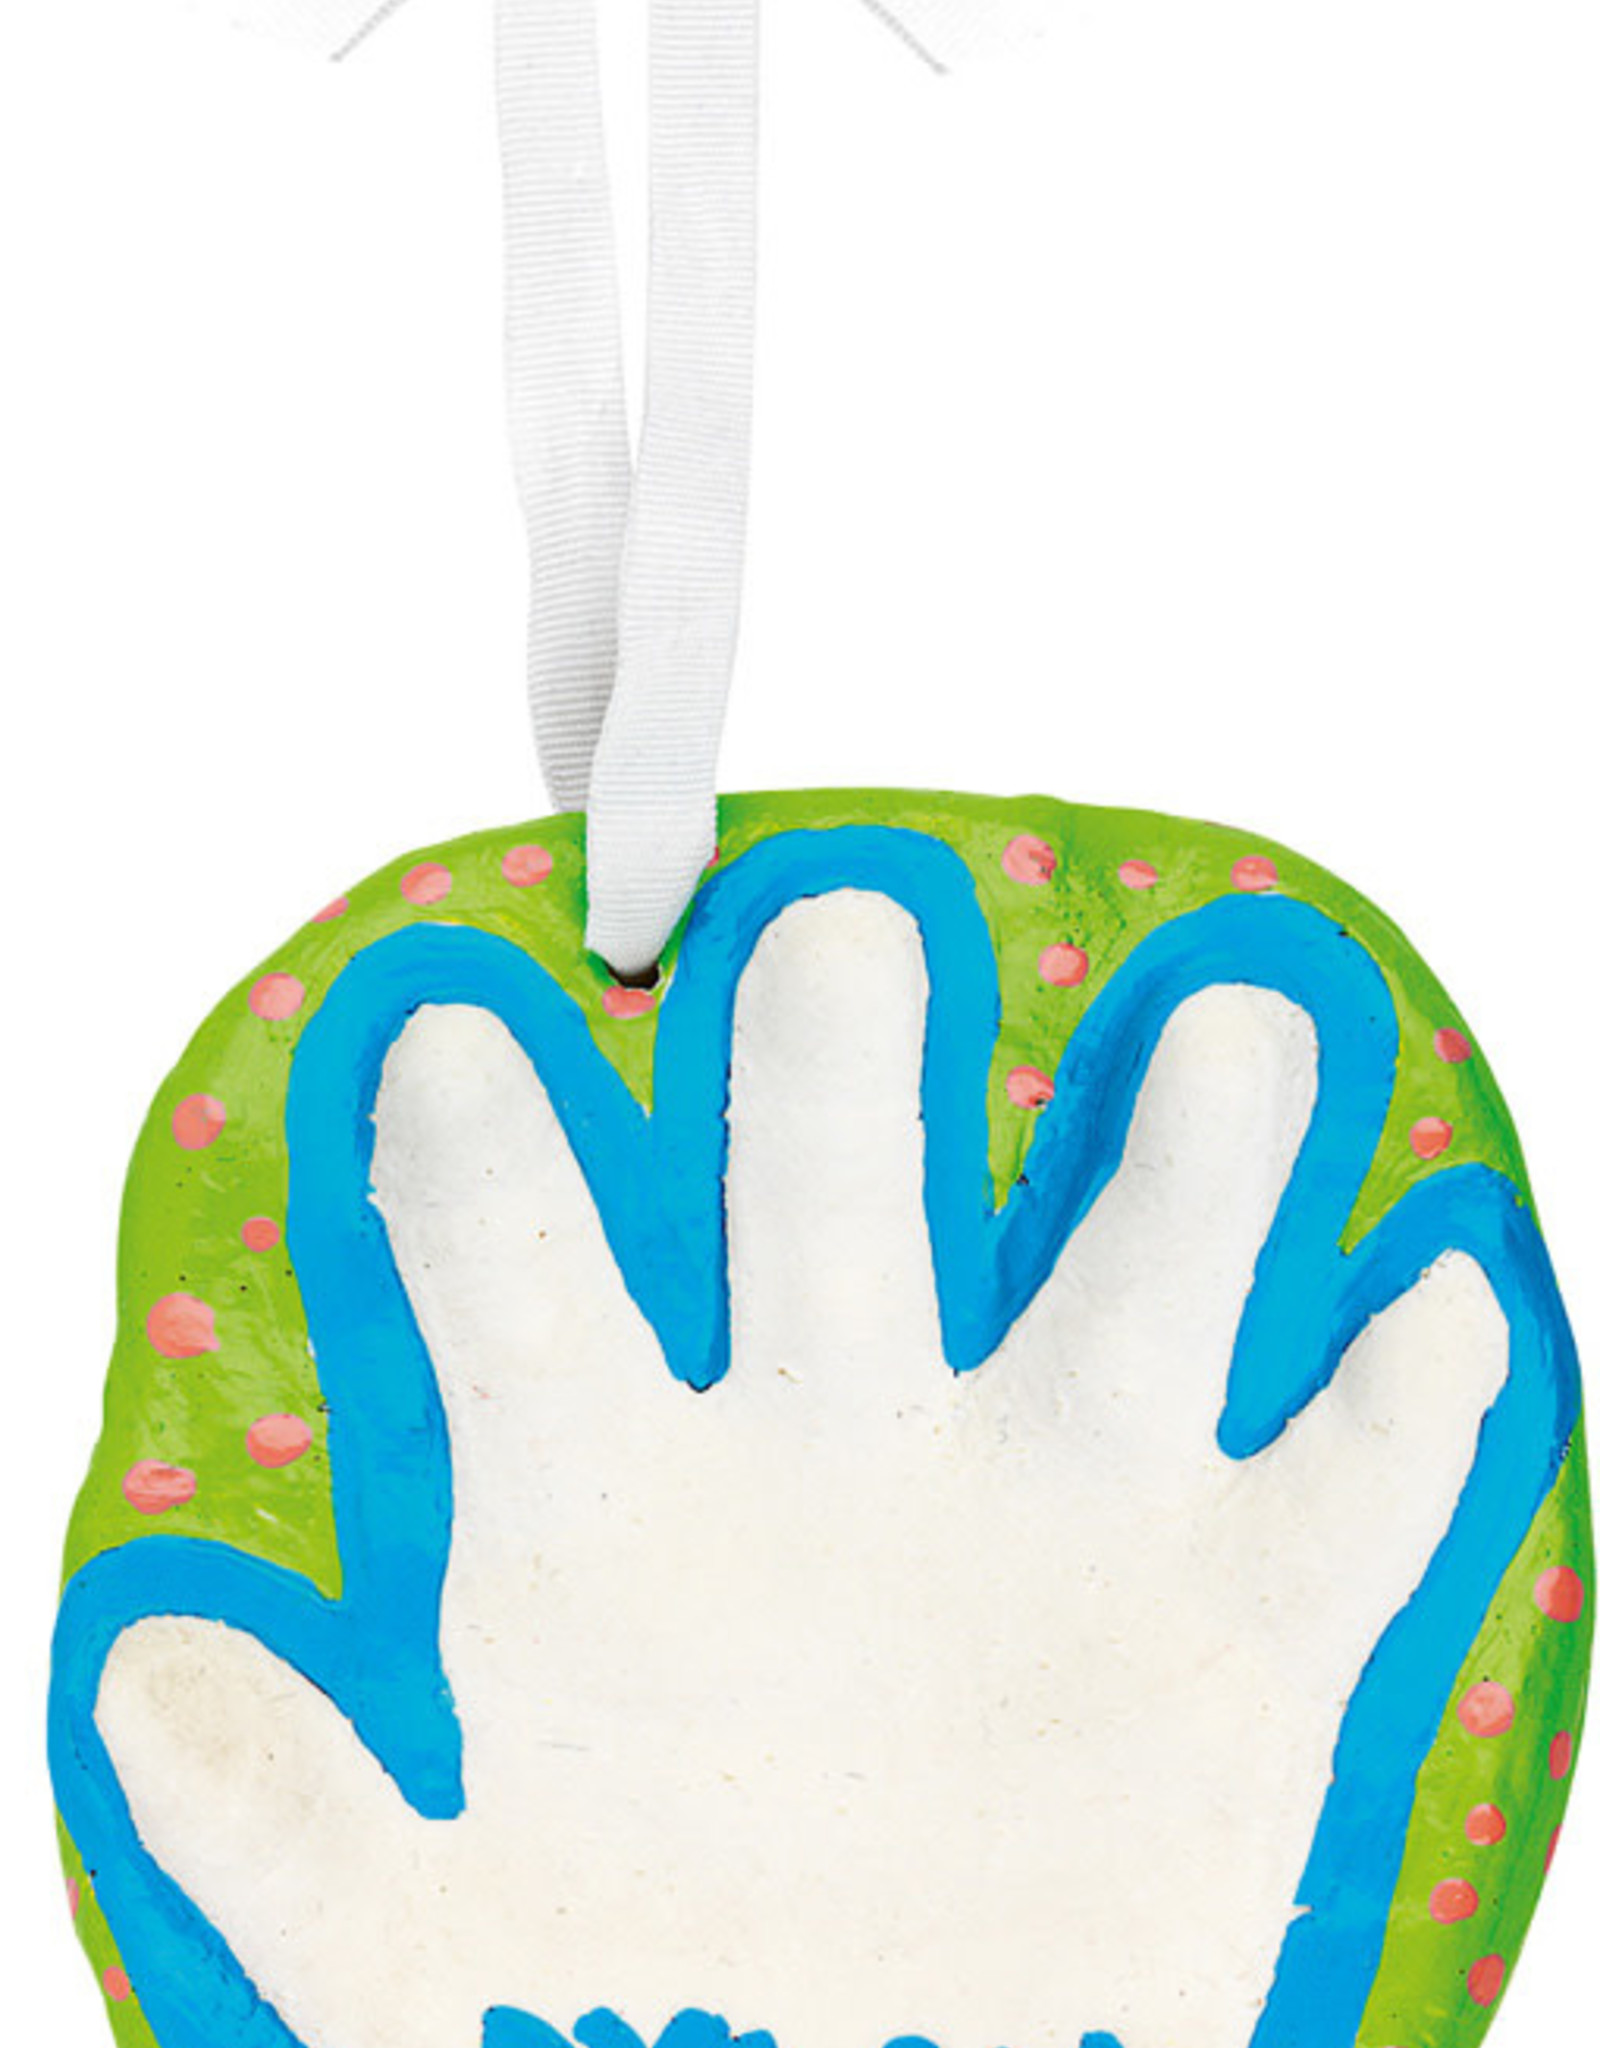 Summer Handprints Class - Tuesday June 22 - Hammonton